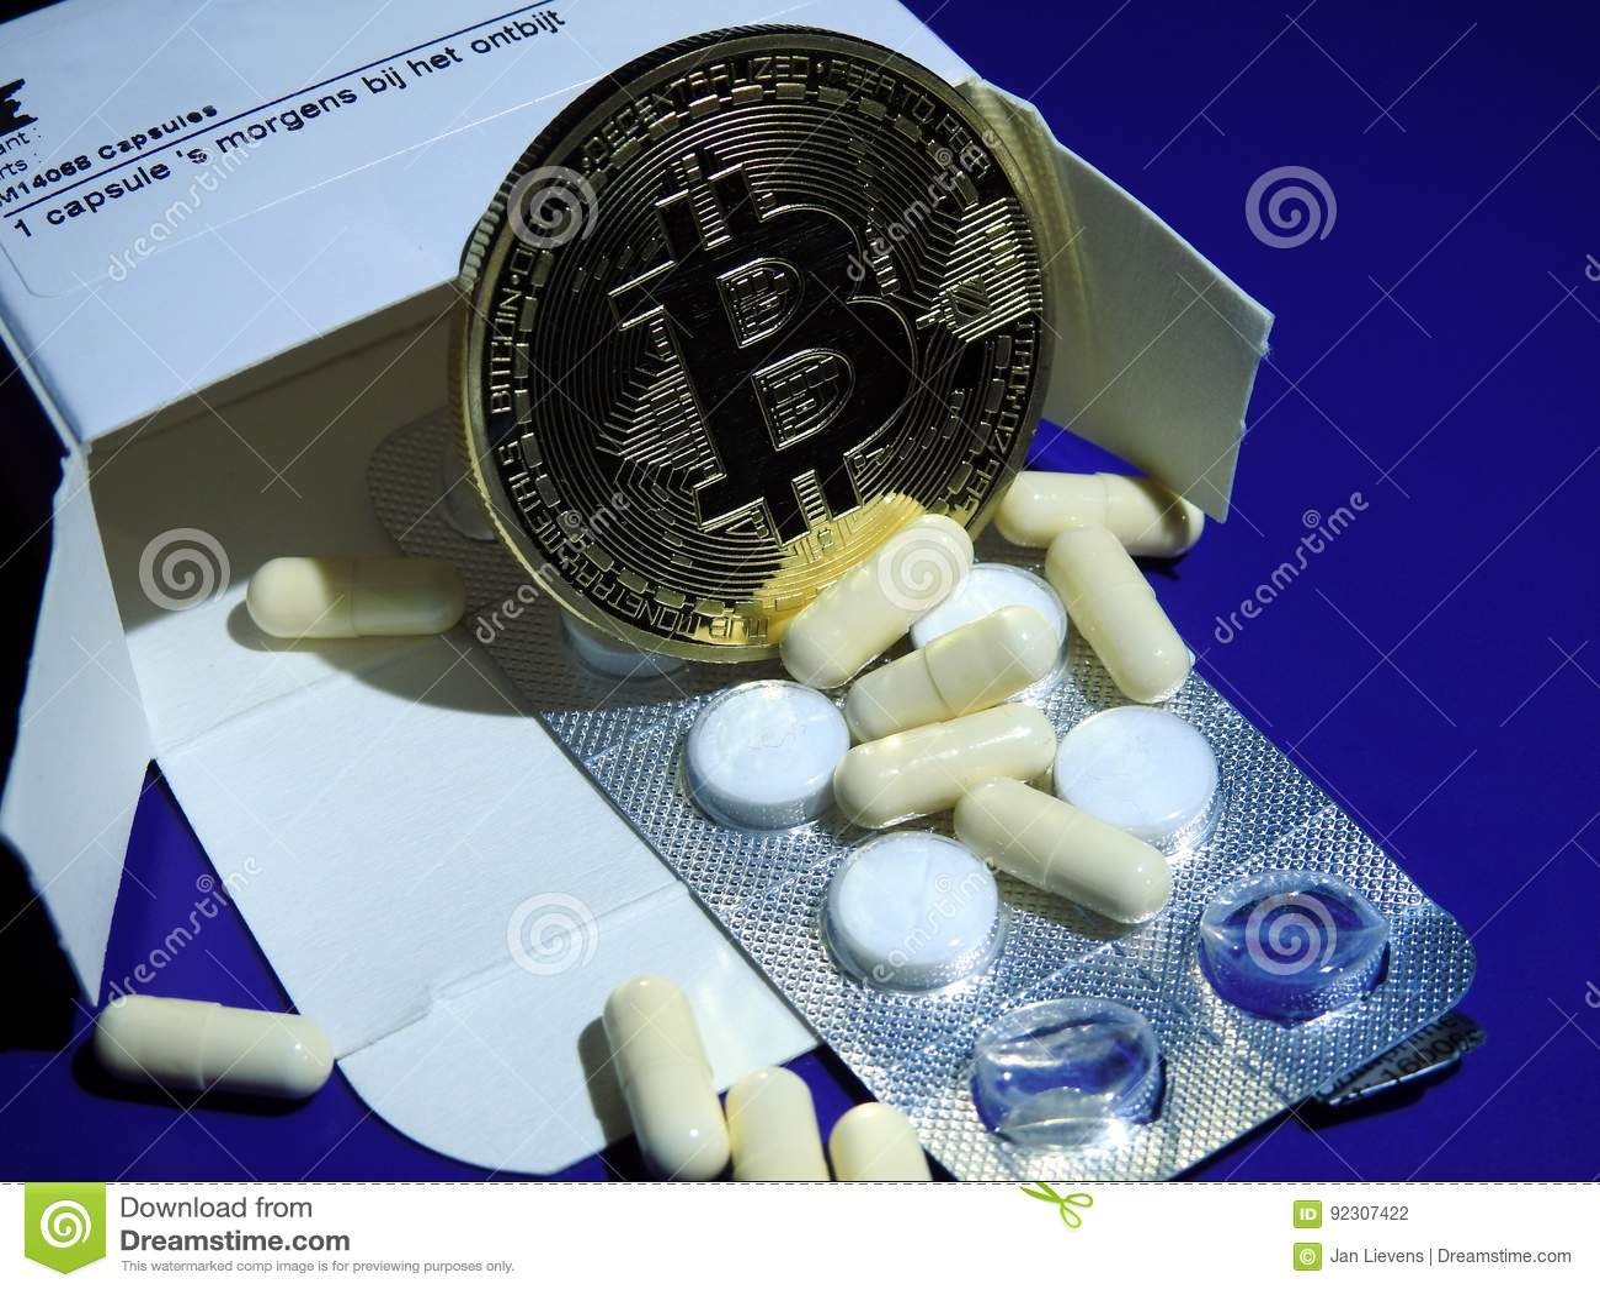 btc medicina)